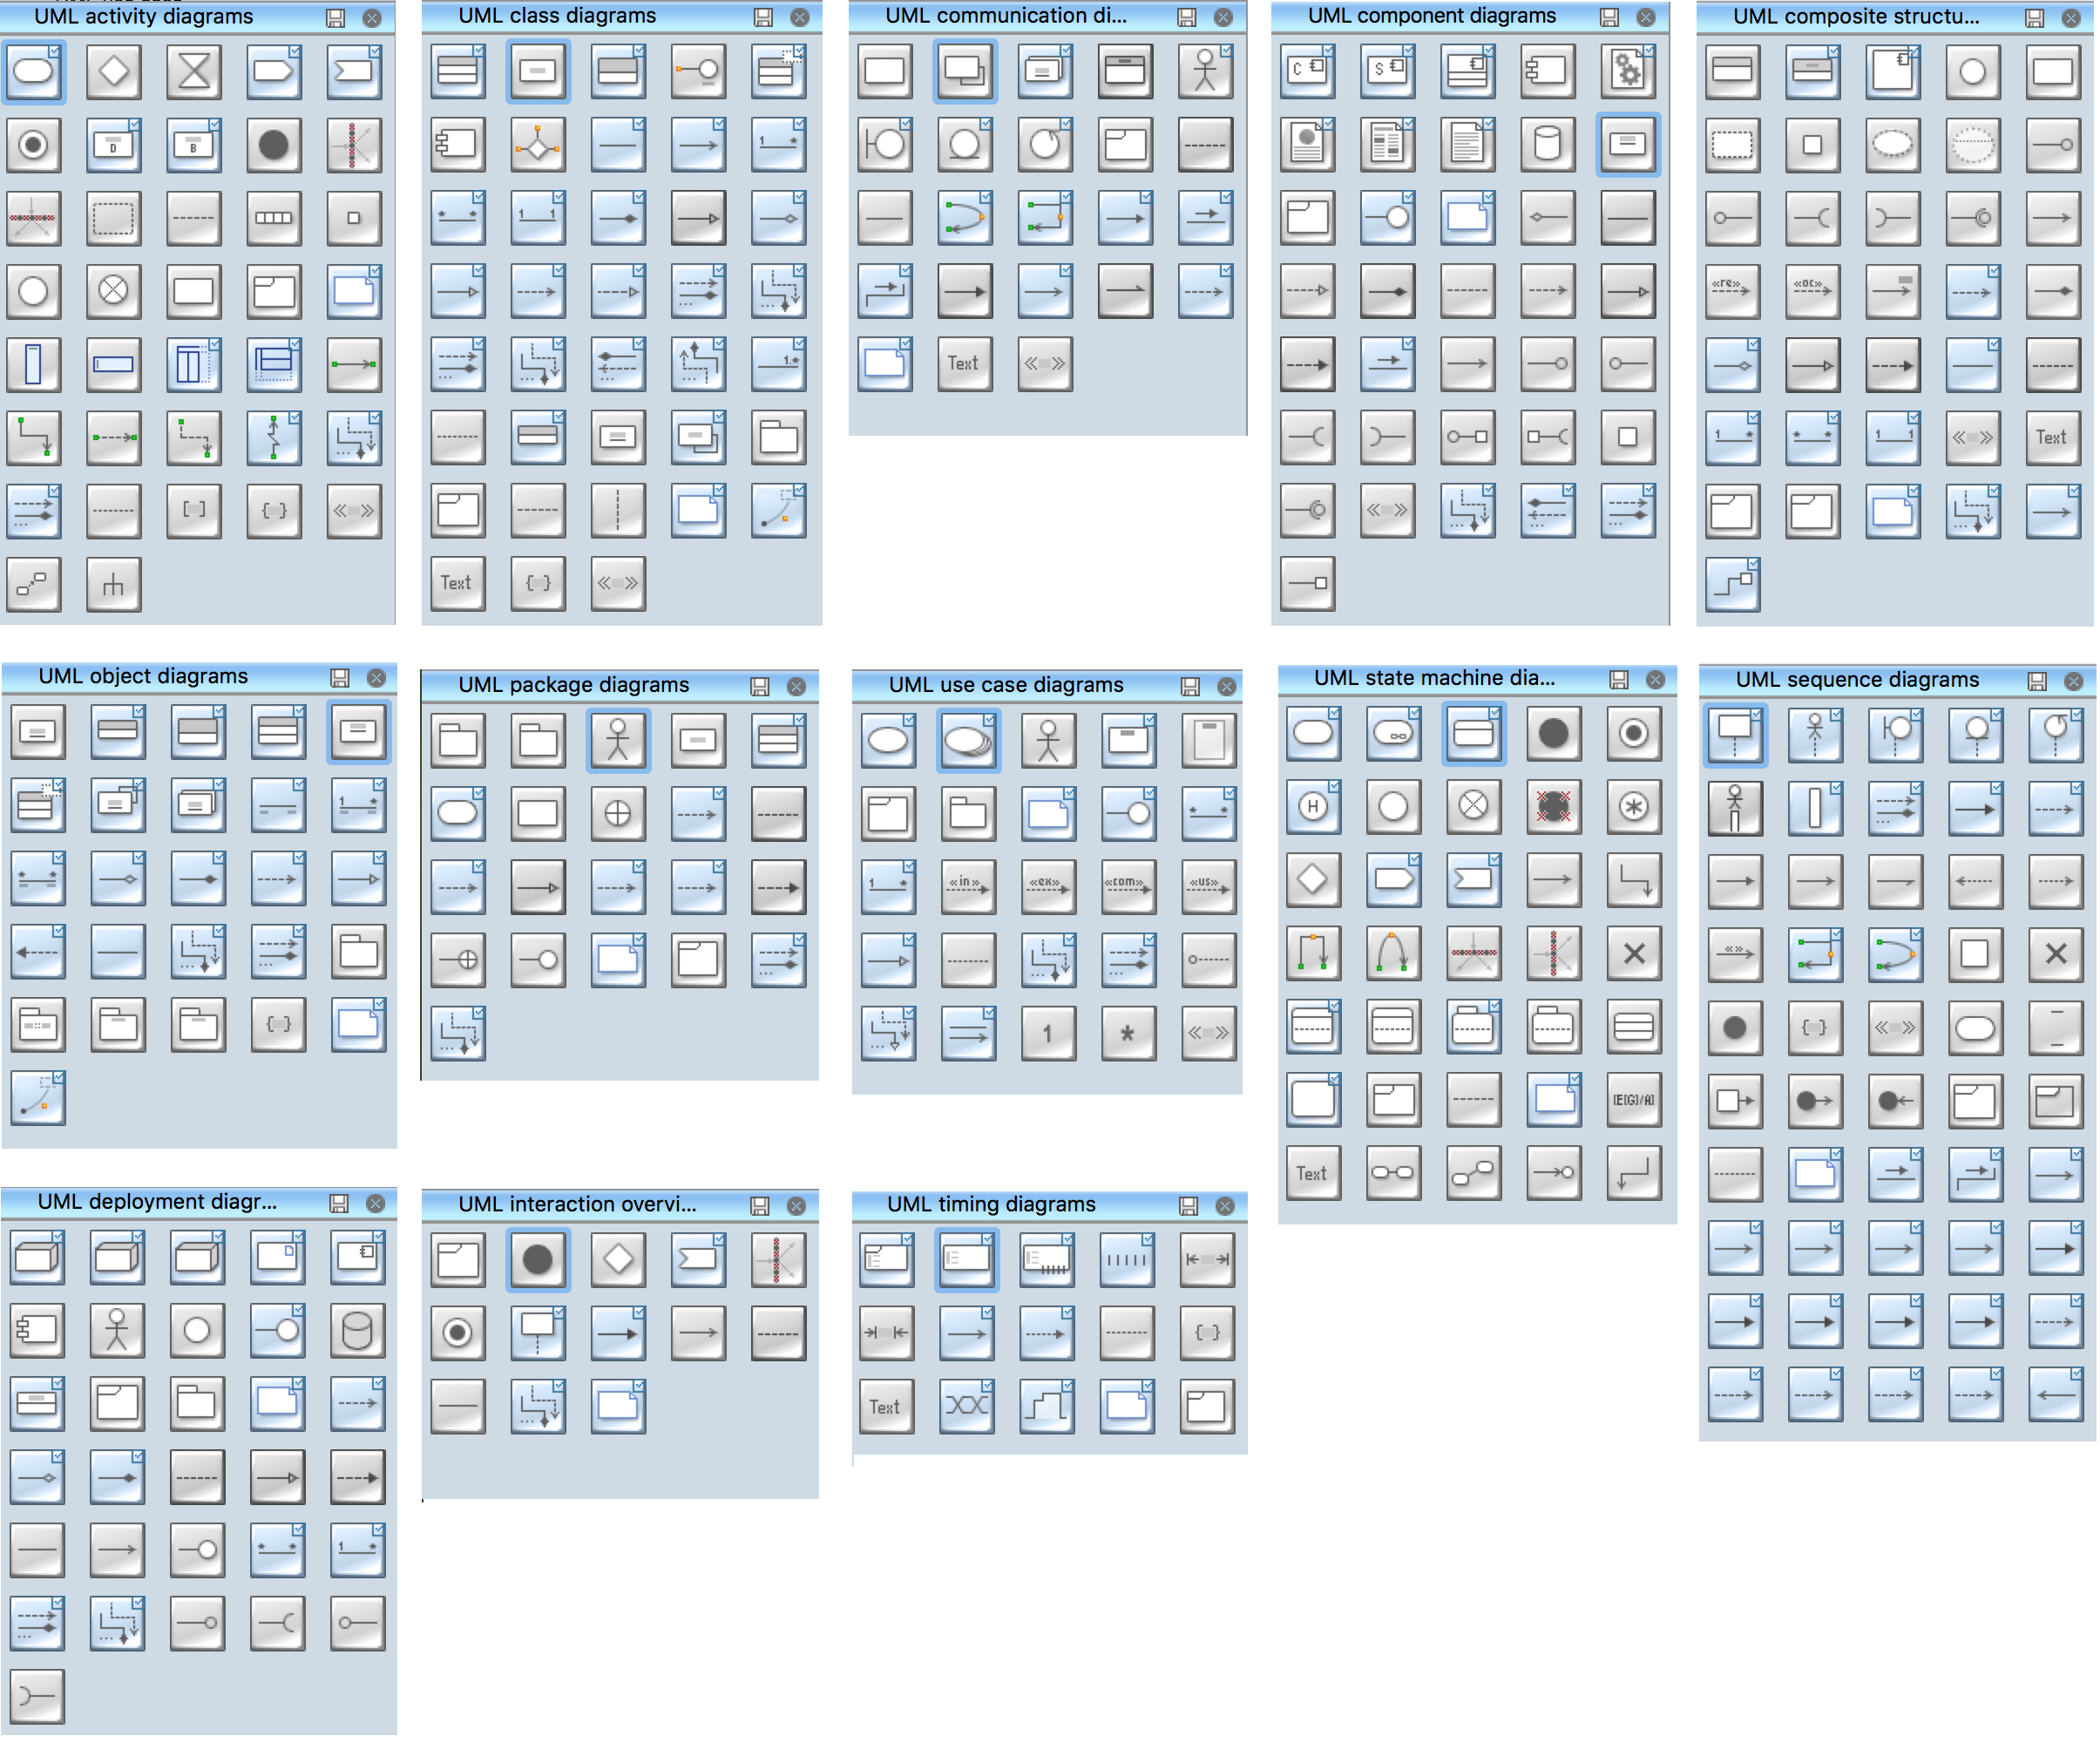 Sales process flowchart flowchart examples sales flowcharts sales process flowchart flowchart examples sales flowcharts geenschuldenfo Image collections